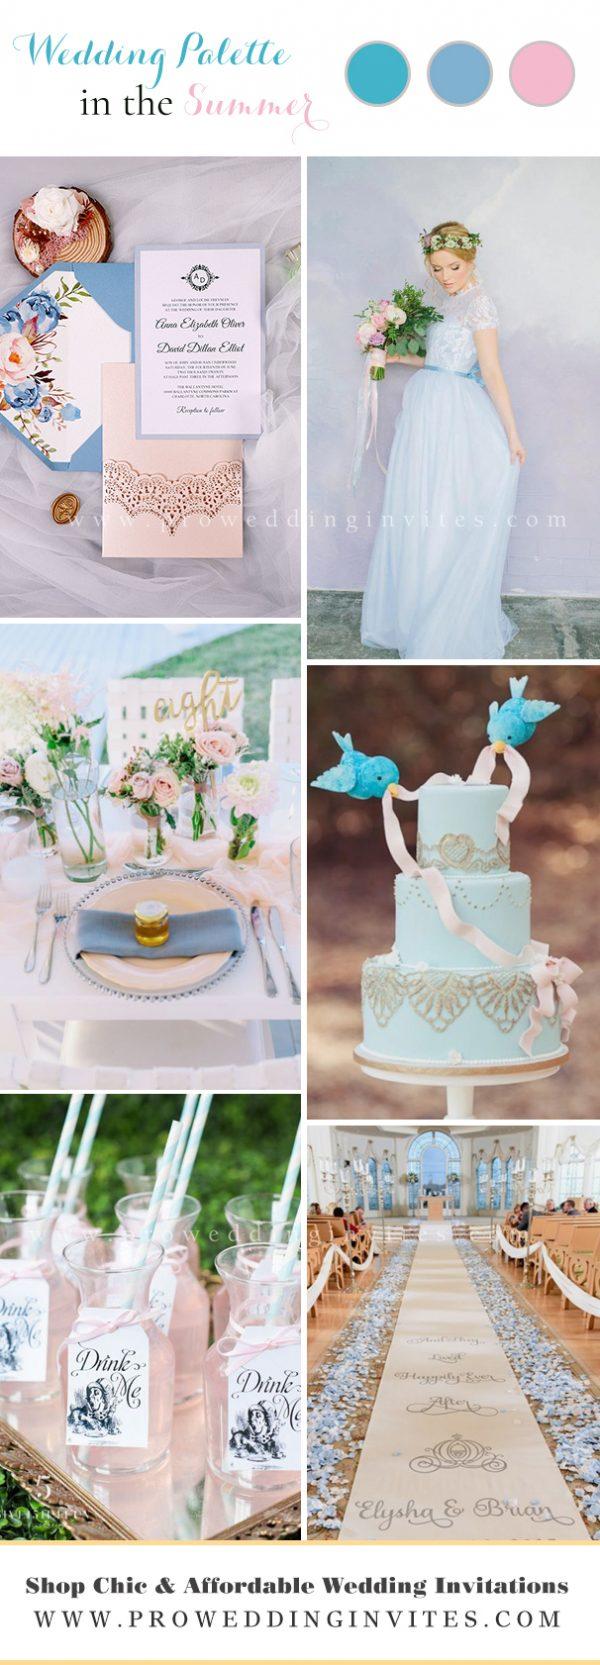 Unexpected EnchantedSummer Wedding Colors: Cinderalla blue, aqua and pink